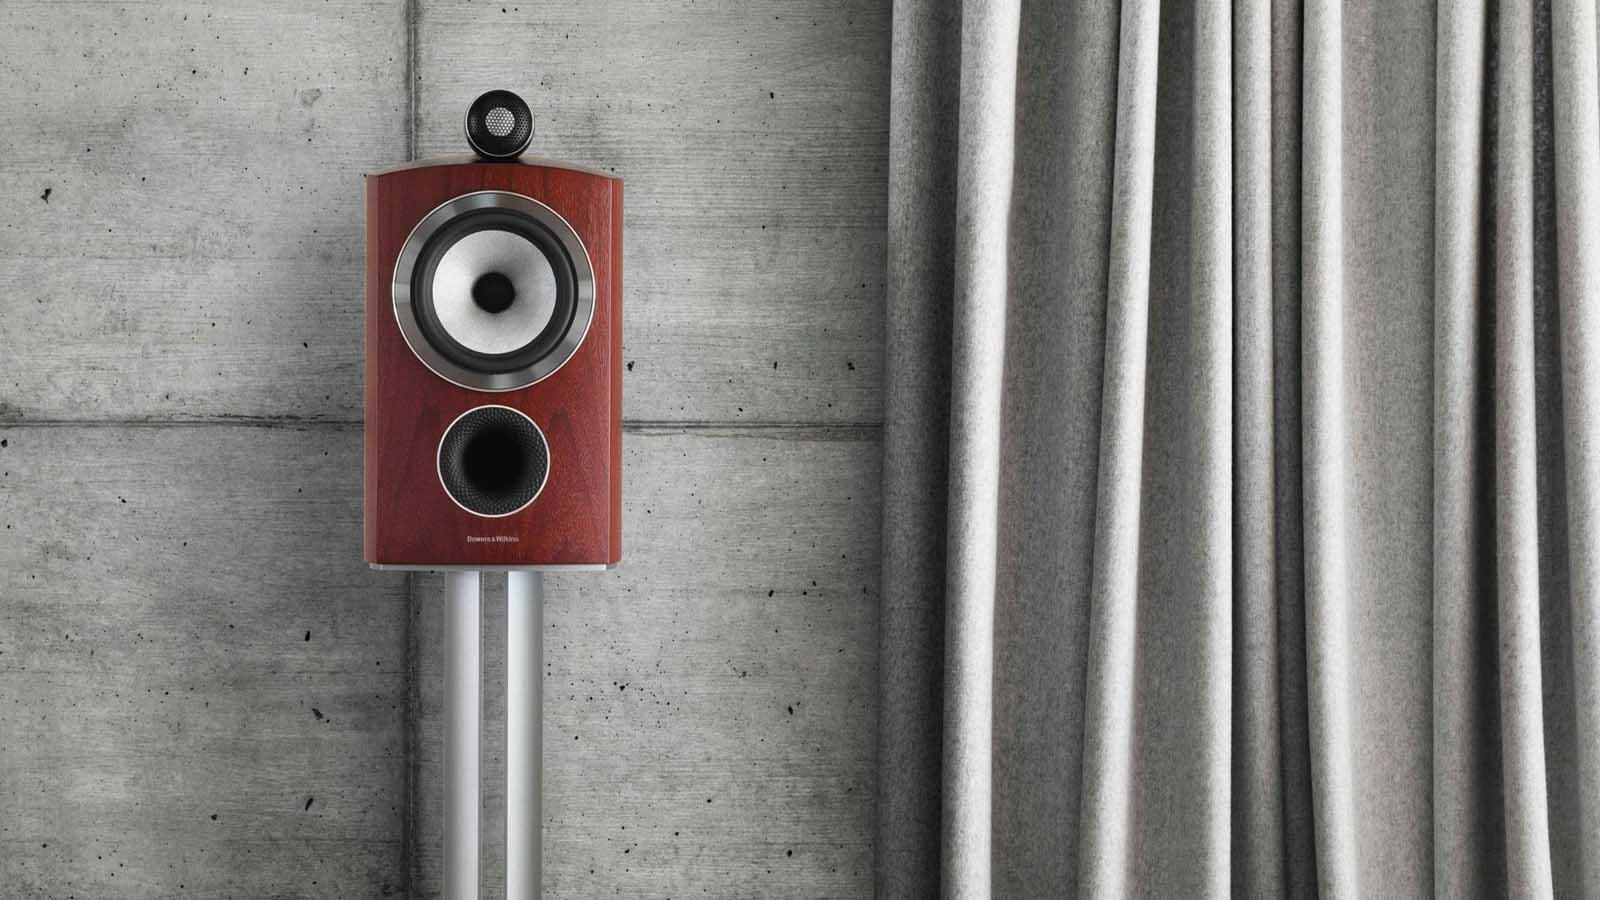 https://lamarque.fillion.ca/wp-content/uploads/2019/04/4-1-d-805-d3-800-series-diamond-speakers-rosenut.jpg